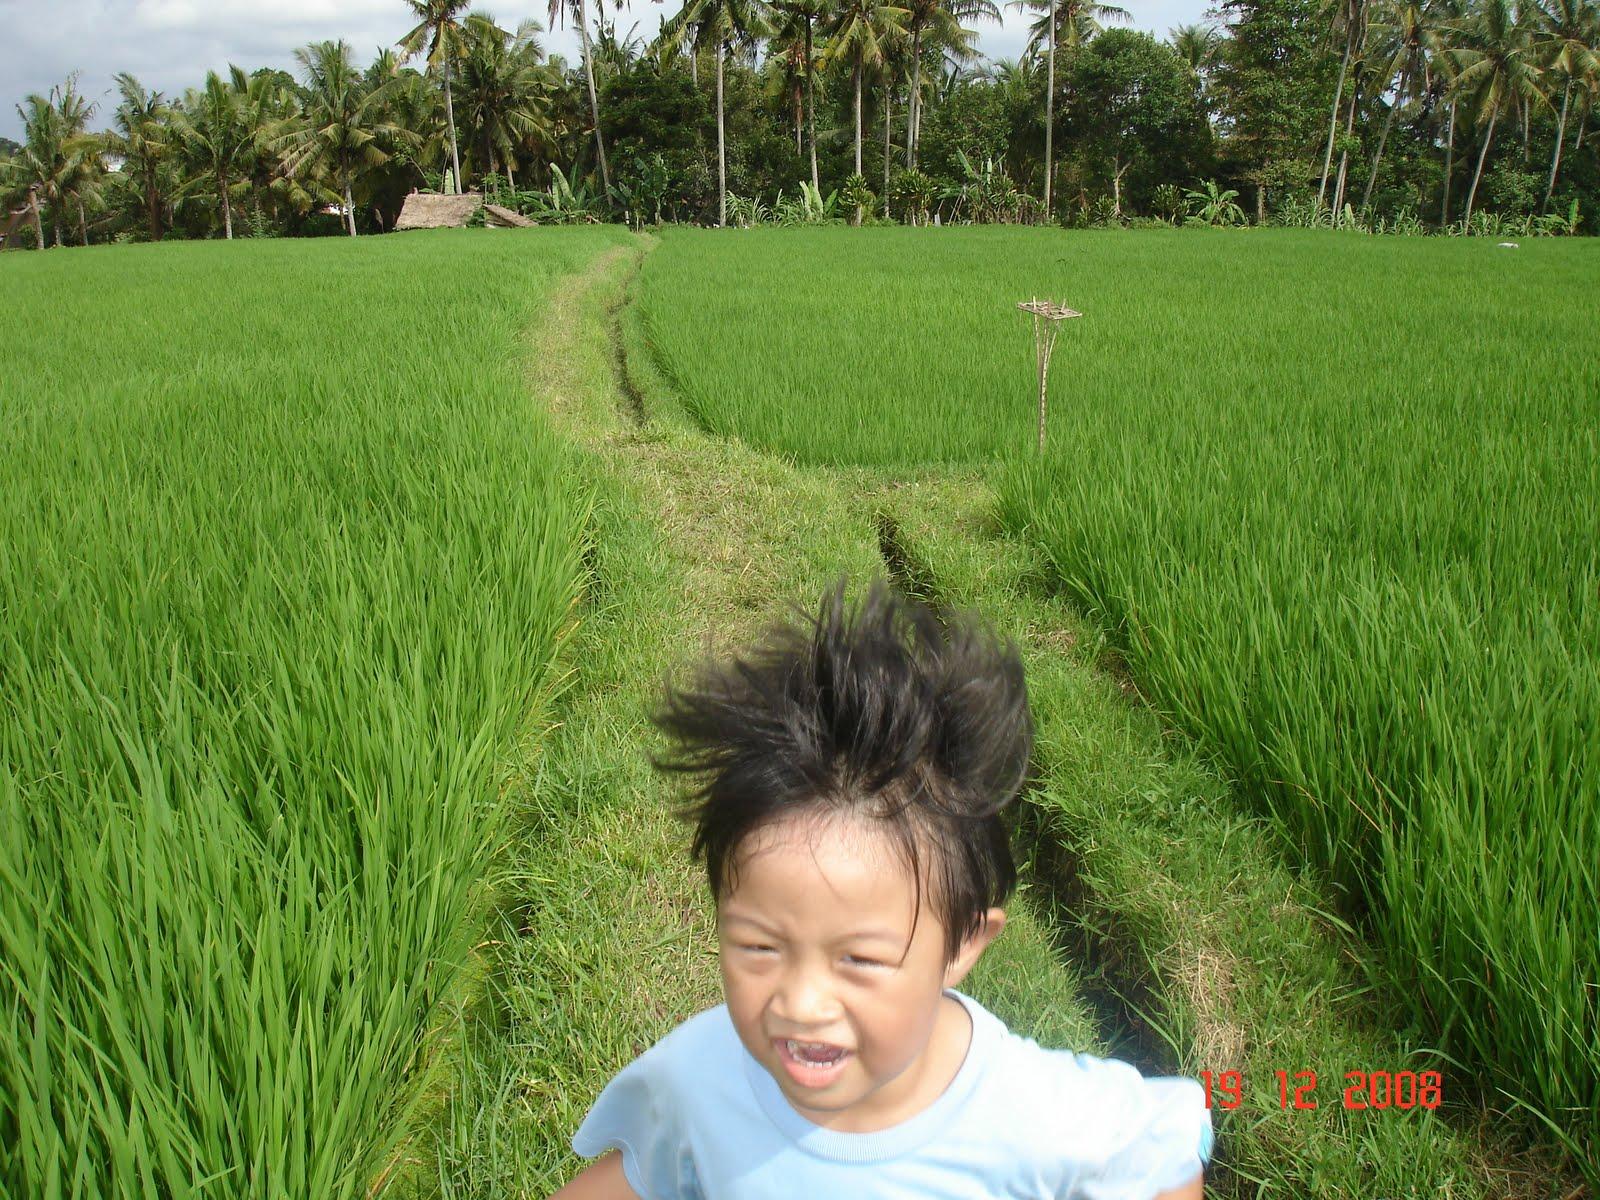 http://1.bp.blogspot.com/-0_llXLlAuTU/TgcJz3wYp8I/AAAAAAAAAFY/A0sUo2rpSjs/s1600/Bali+2008+299.jpg